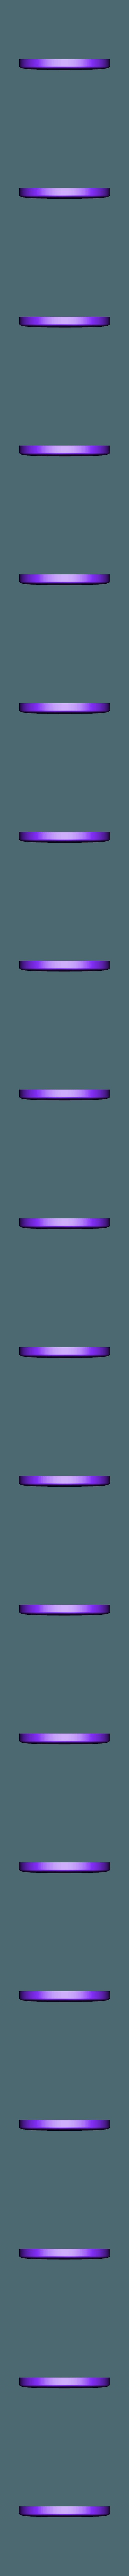 9-Top-Plate.stl Download free STL file Bath and Body Works - Candle Holder (10cm Ø) • 3D print design, crisonescu